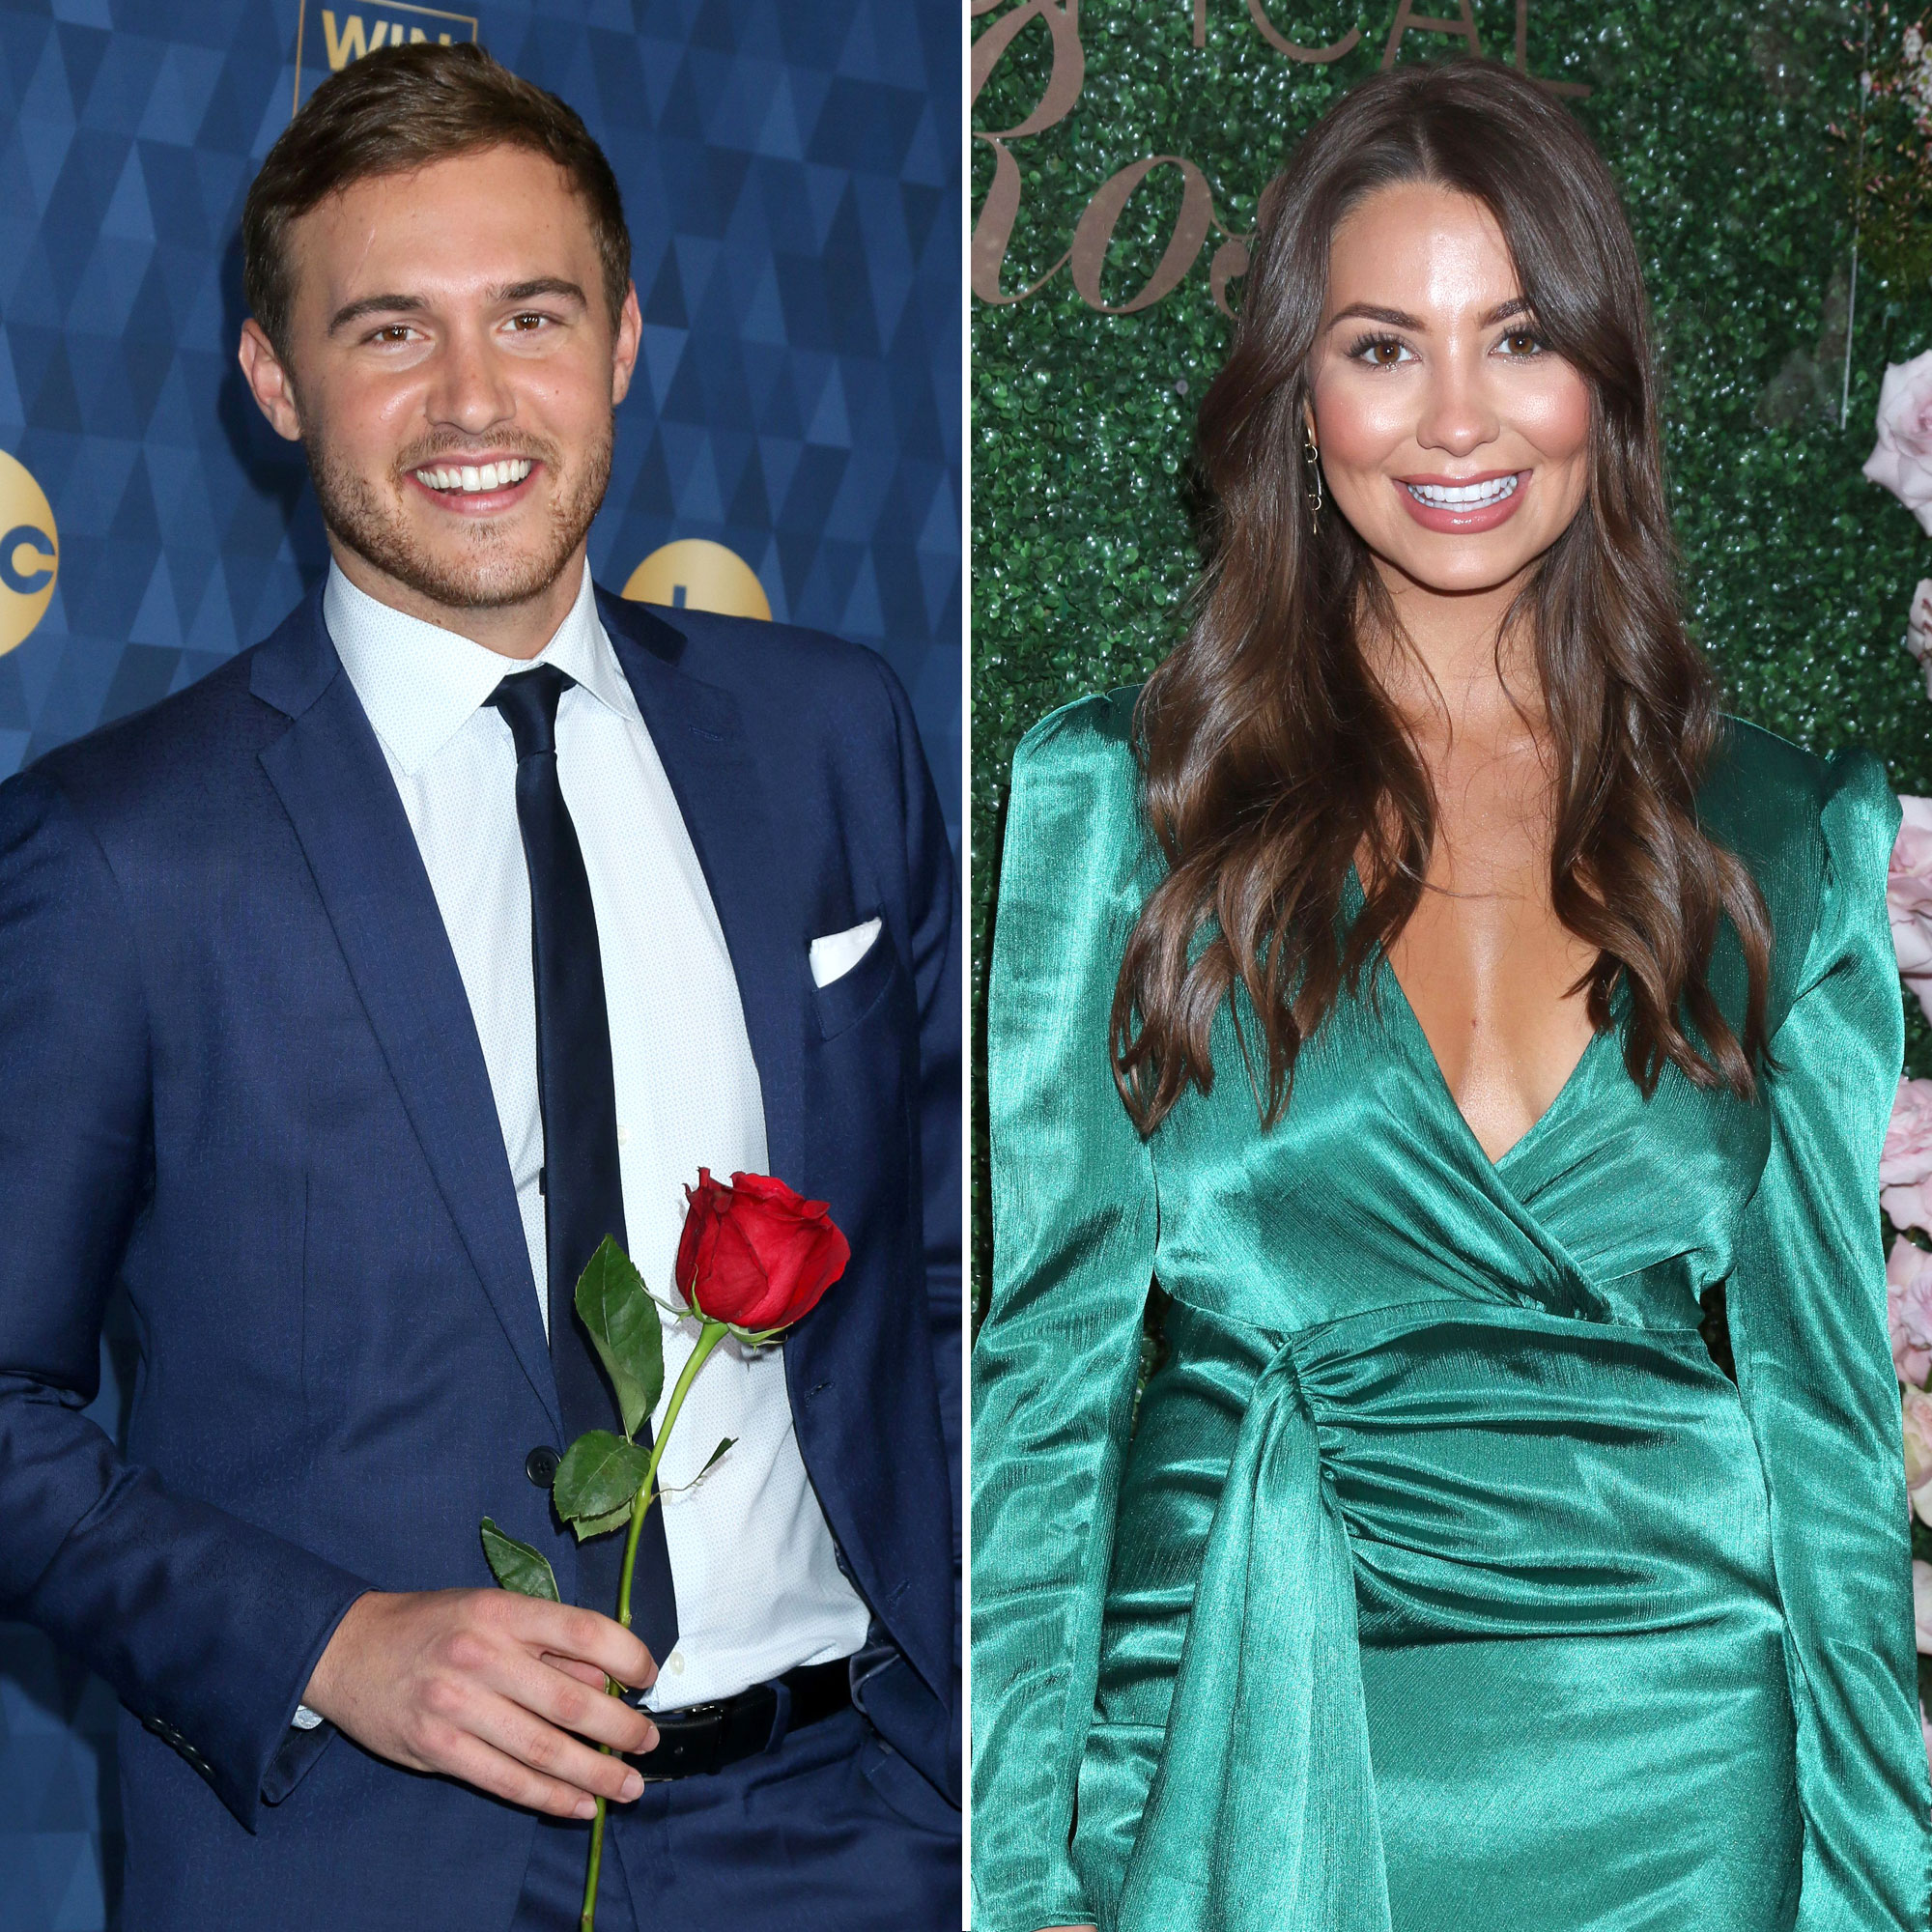 Bachelor Peter Weber Breaks His Silence on Kelley Flanagan Dating Rumors